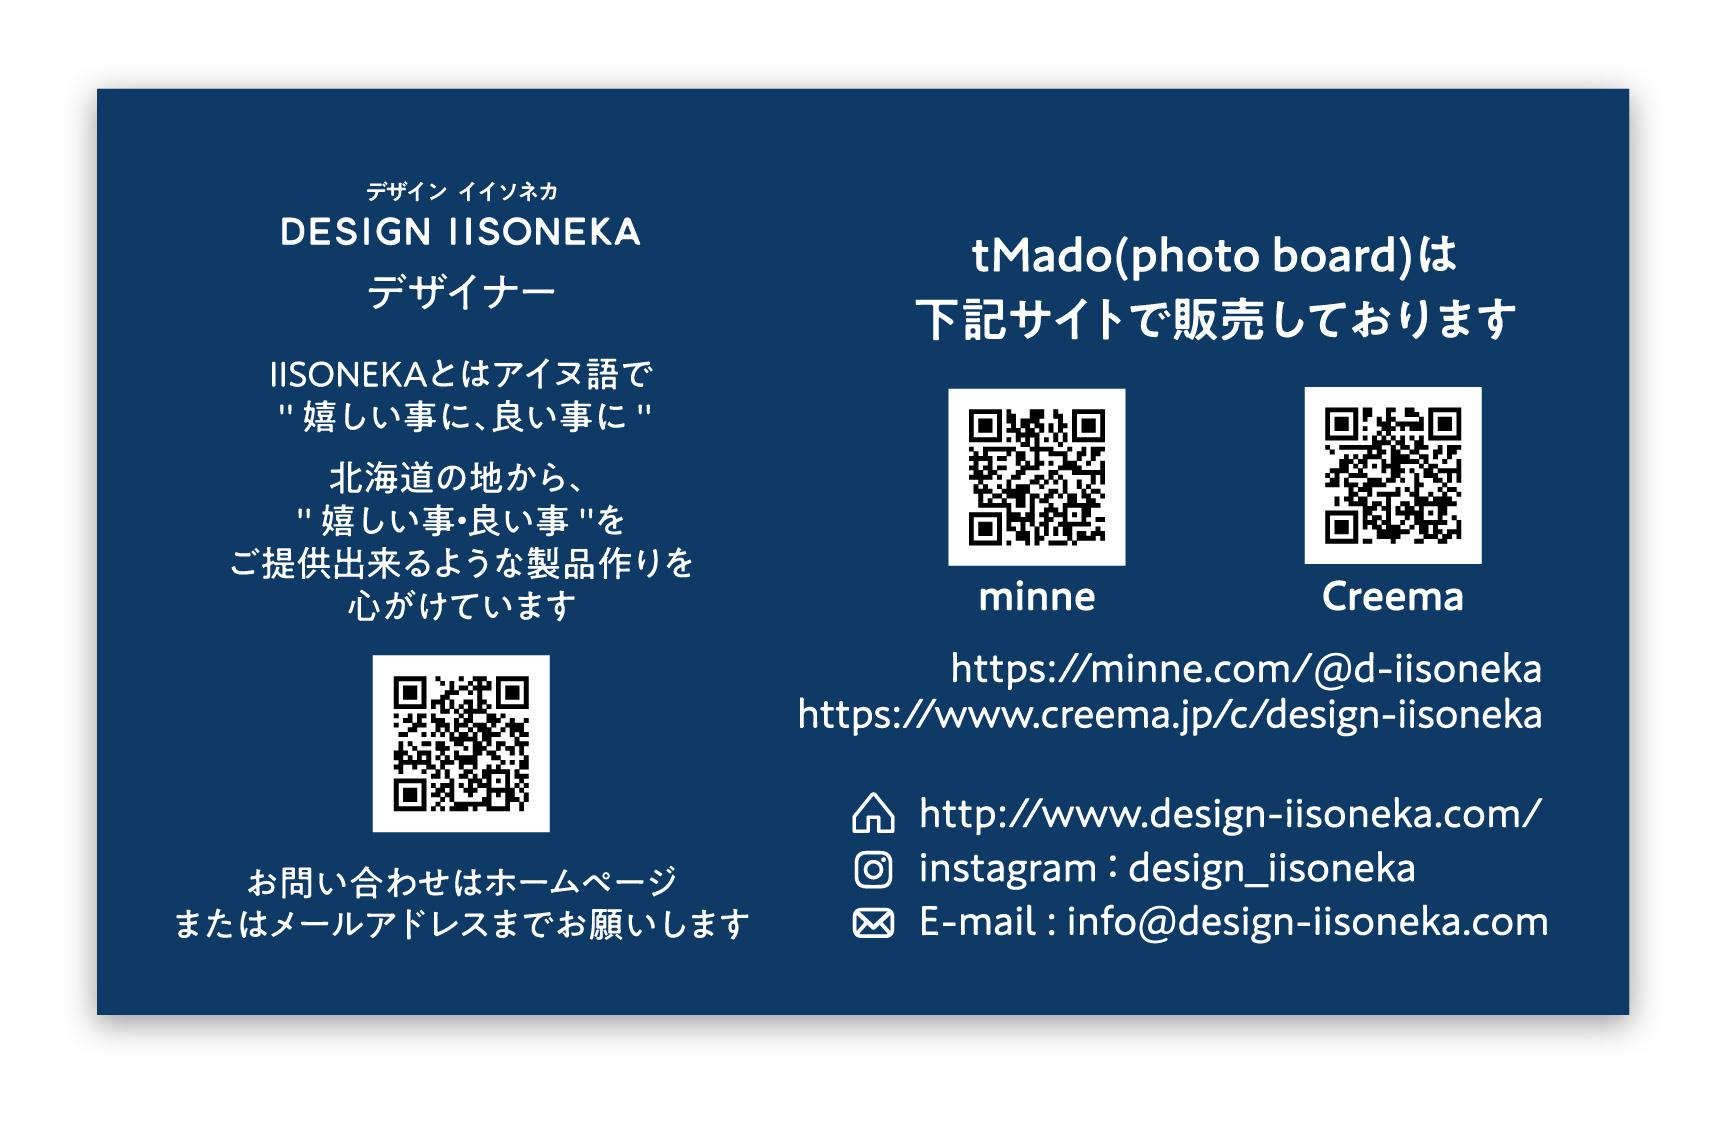 「tMado PHOTO BOARD  ショップカード」(名刺サイズ) イメージ2